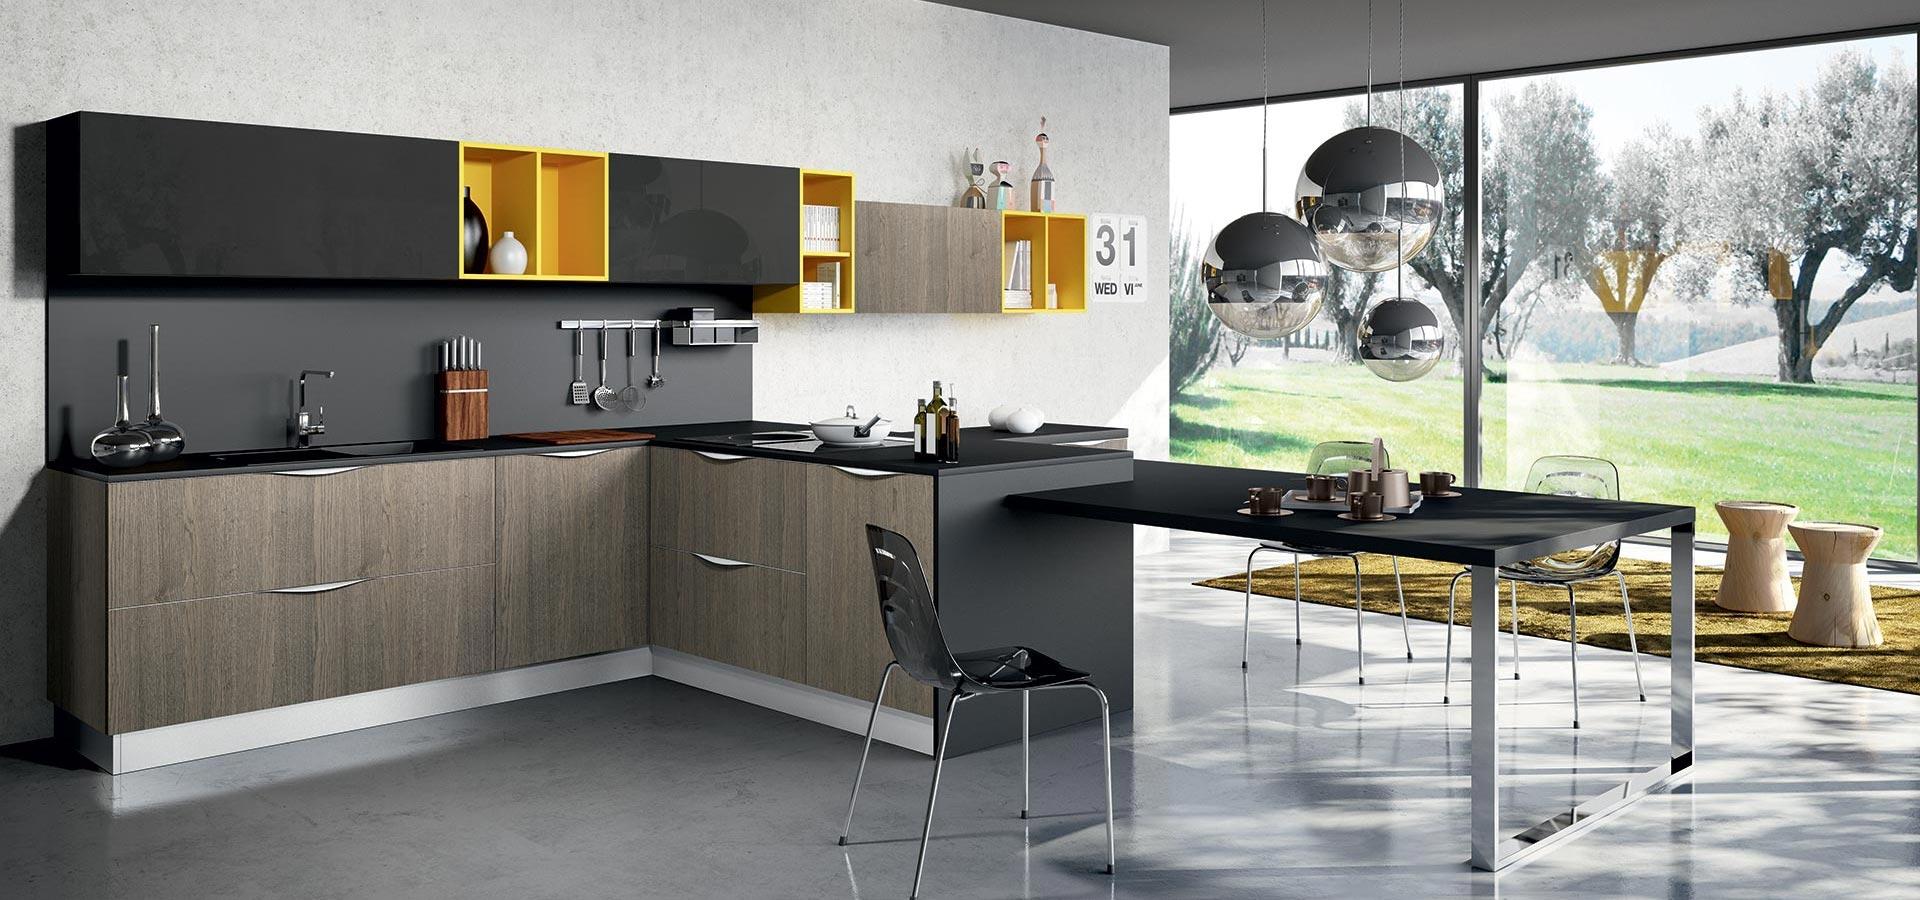 Arredo3 cucina round in laminato finitura rovere cucine - Cucine d arredo ...